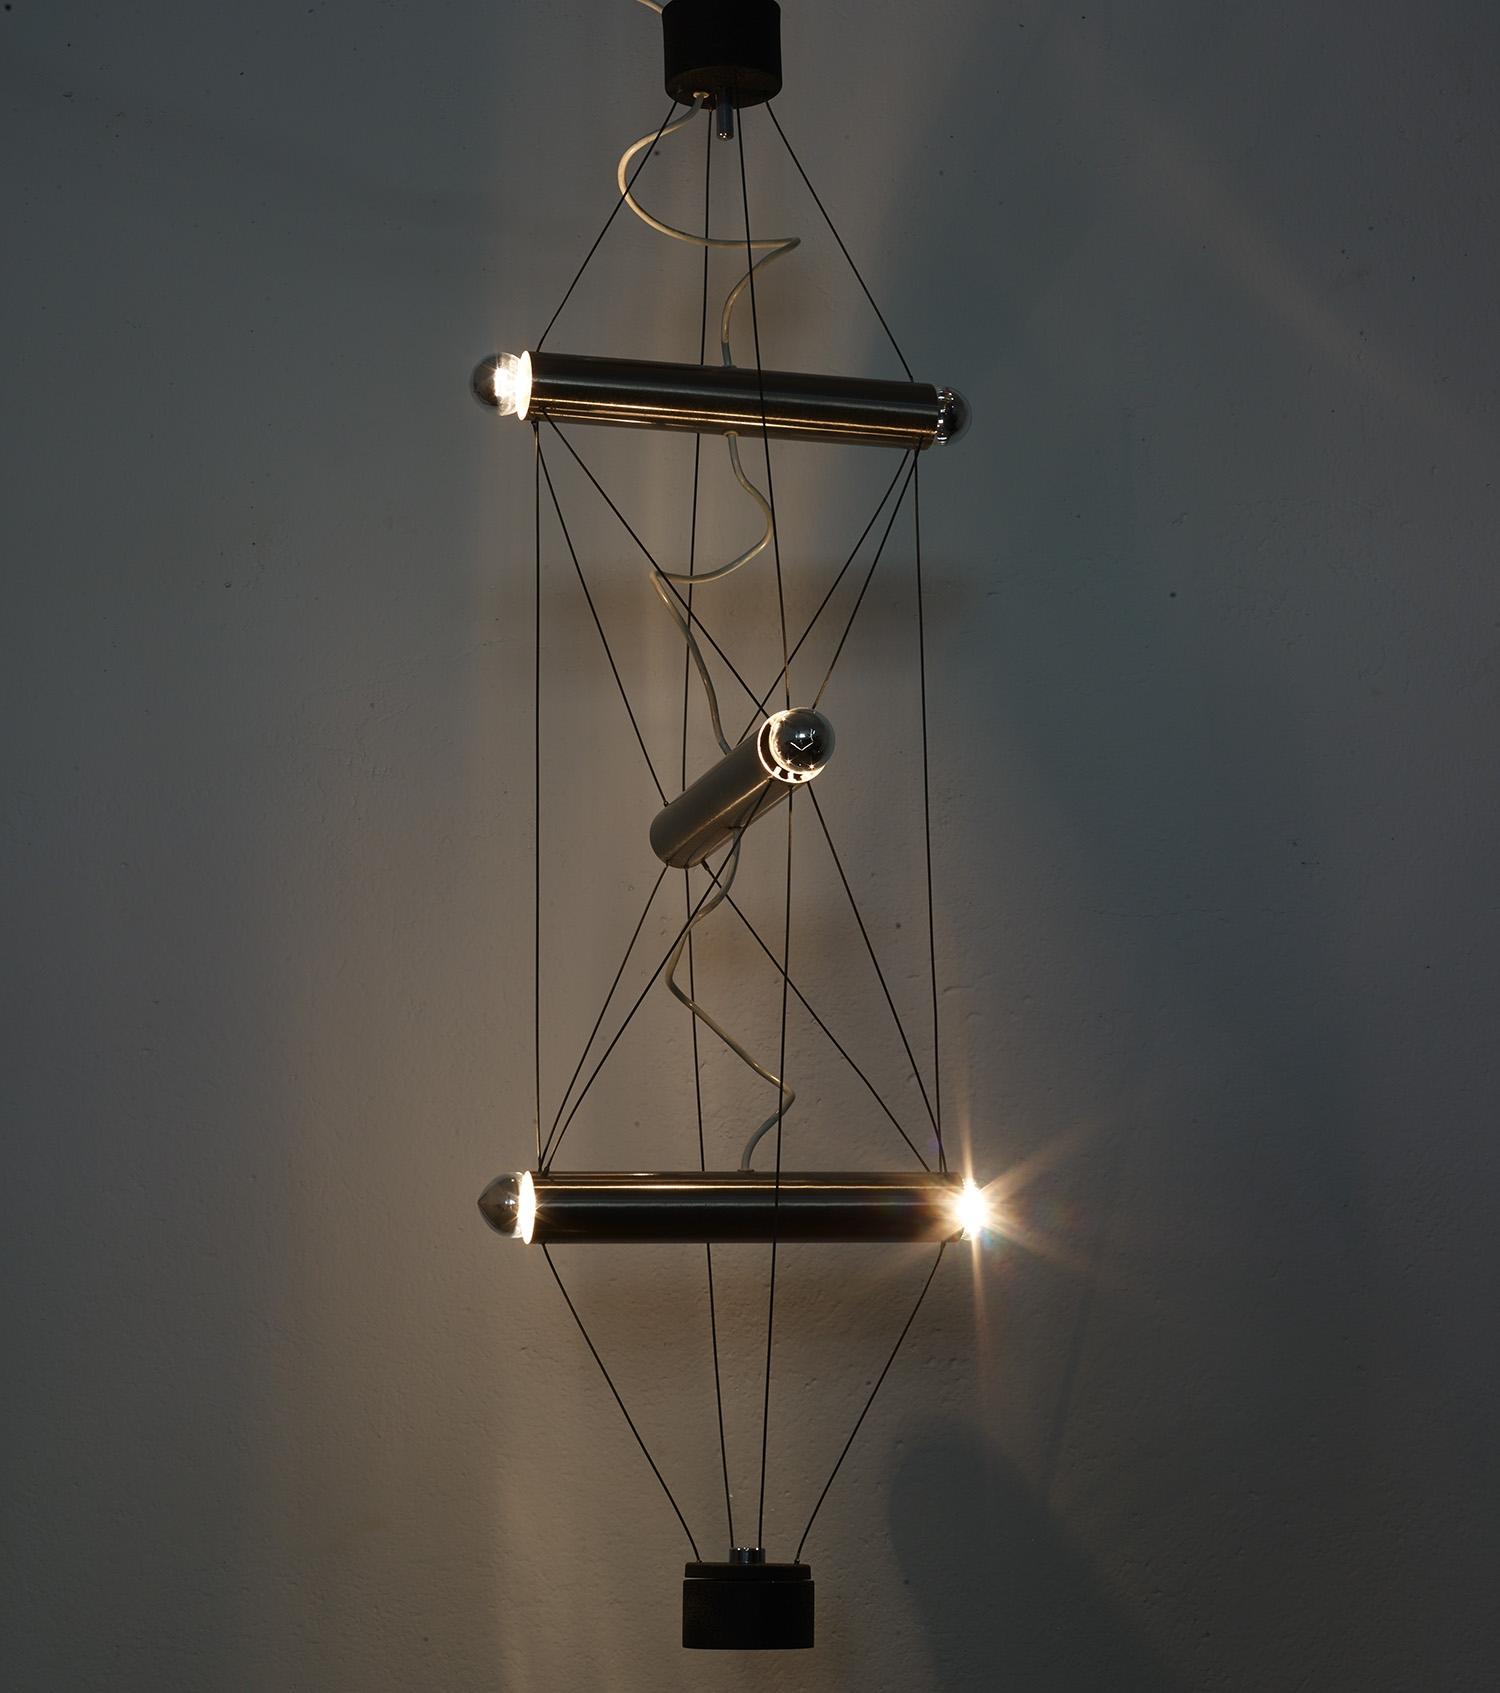 suspension-by-lumi-1970-image-02